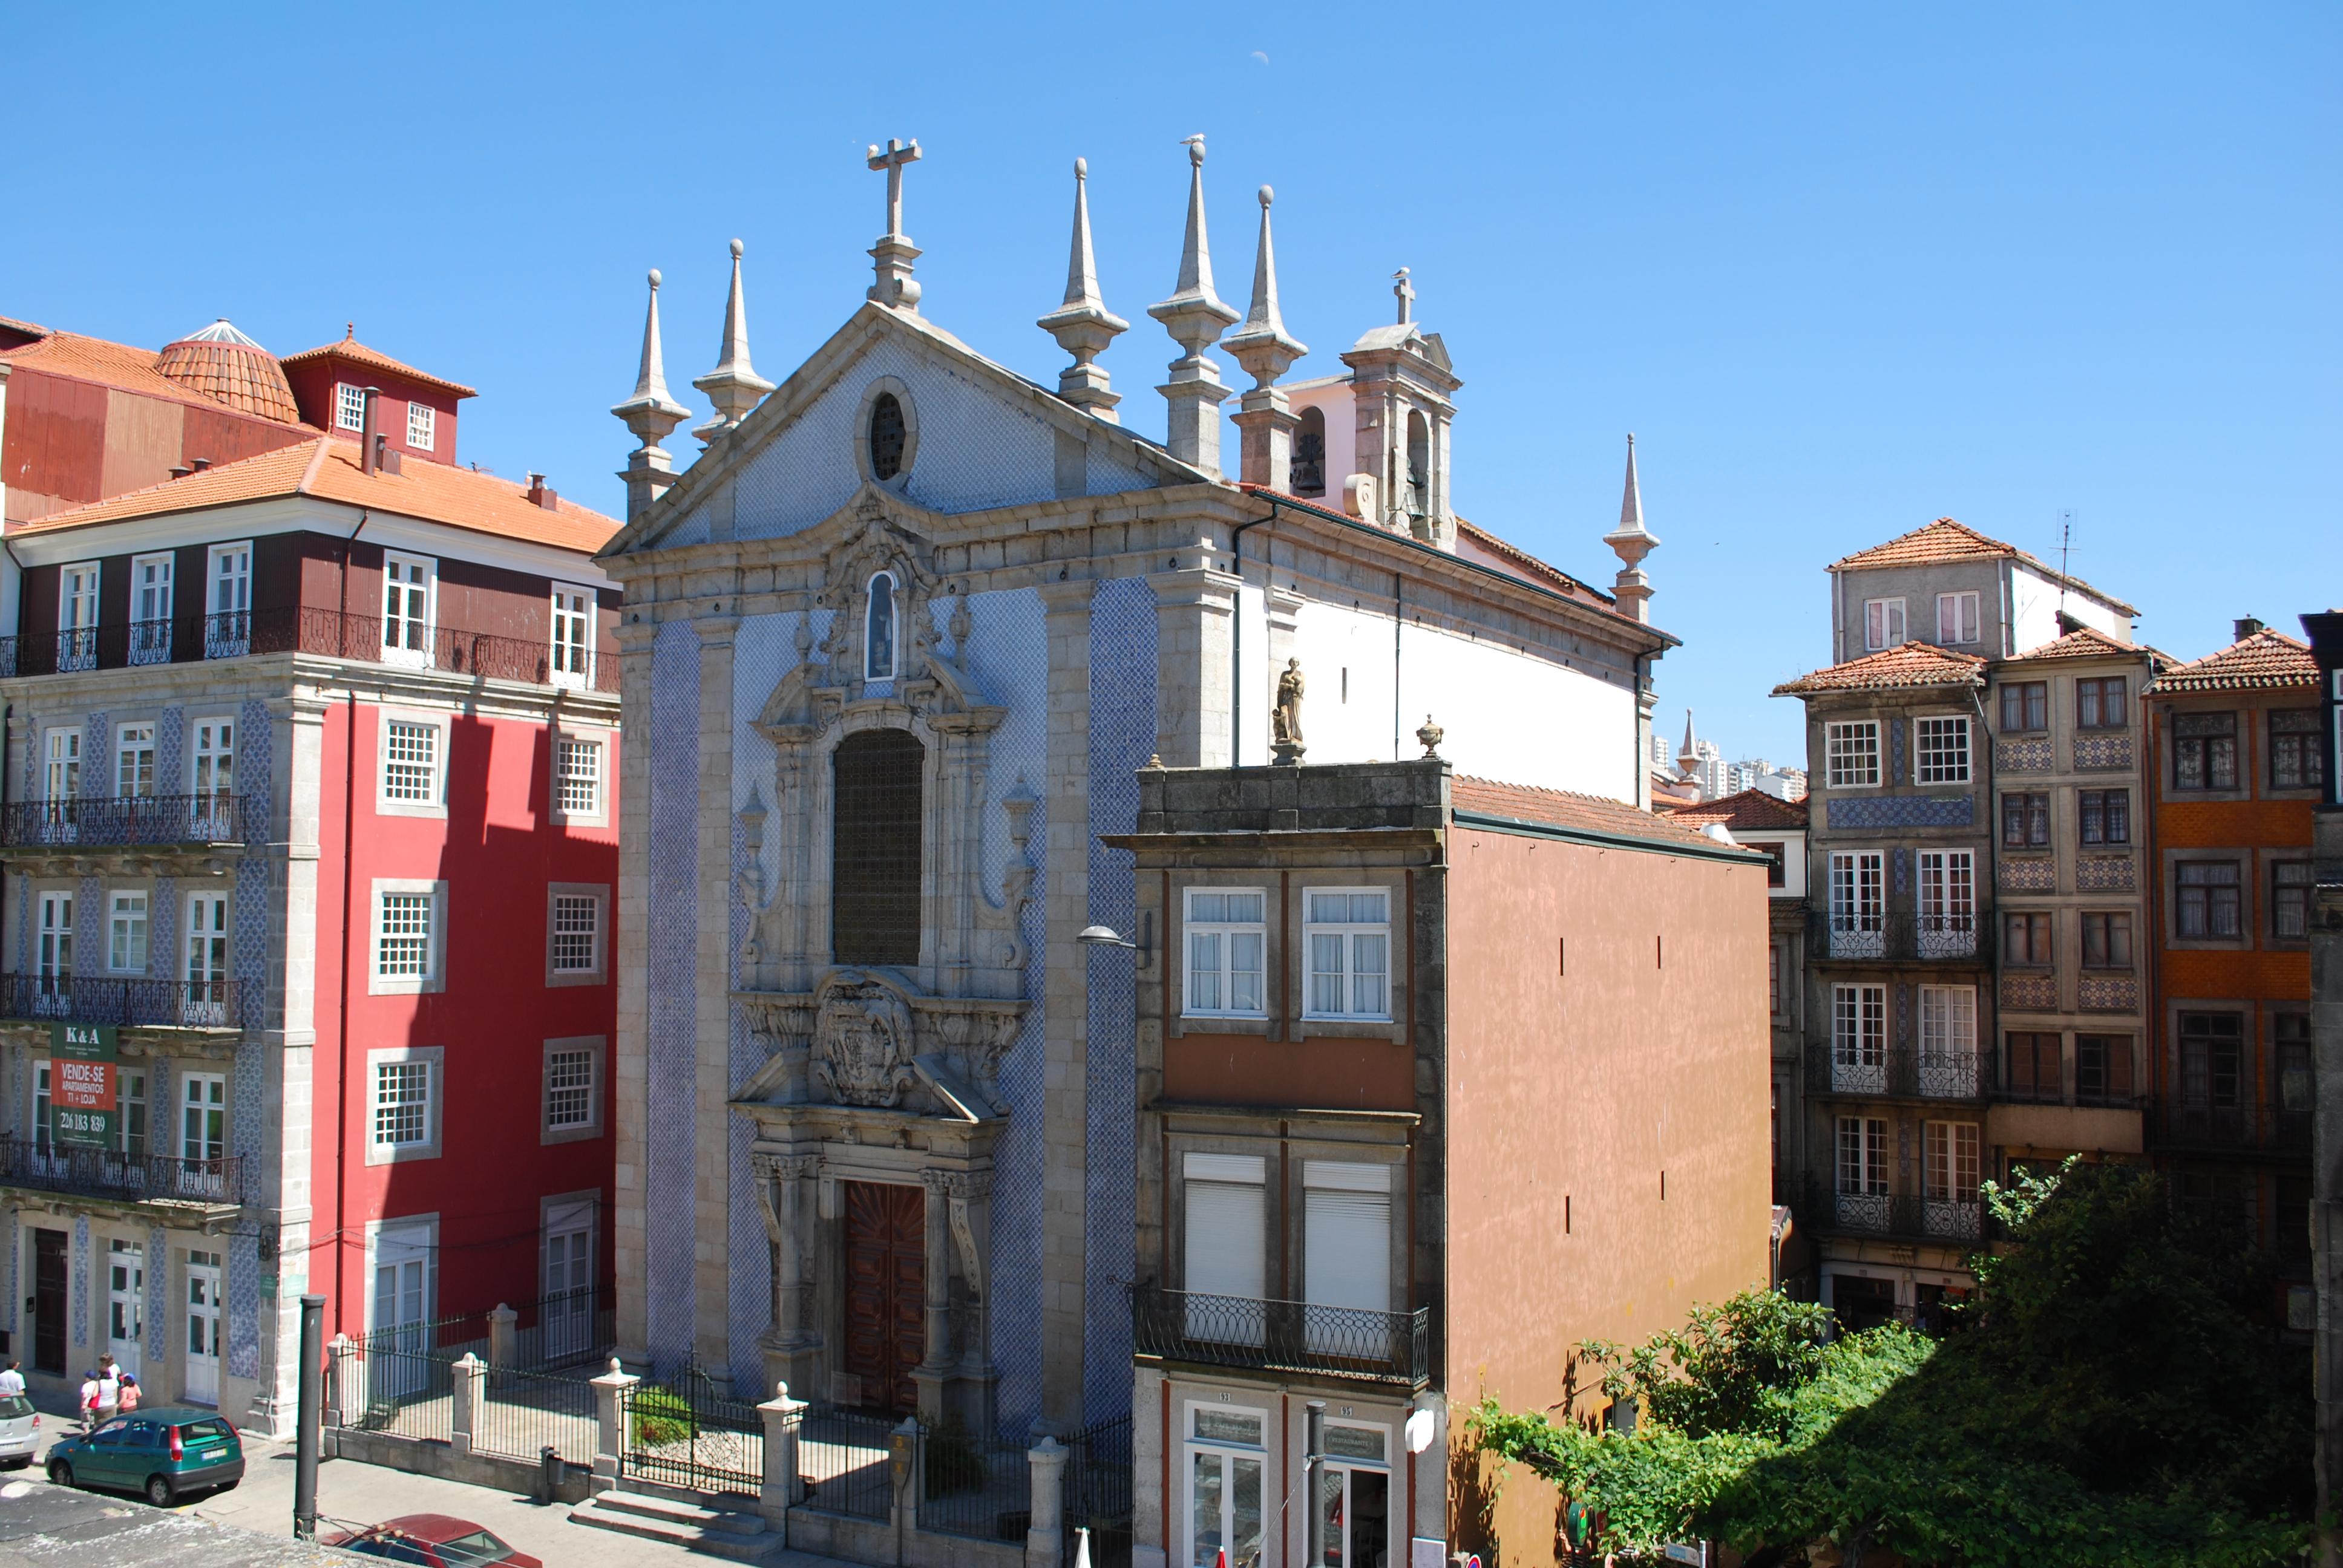 738003fcb54e File:Porto - Igreja de São Nicolau (2).jpg - Wikimedia Commons